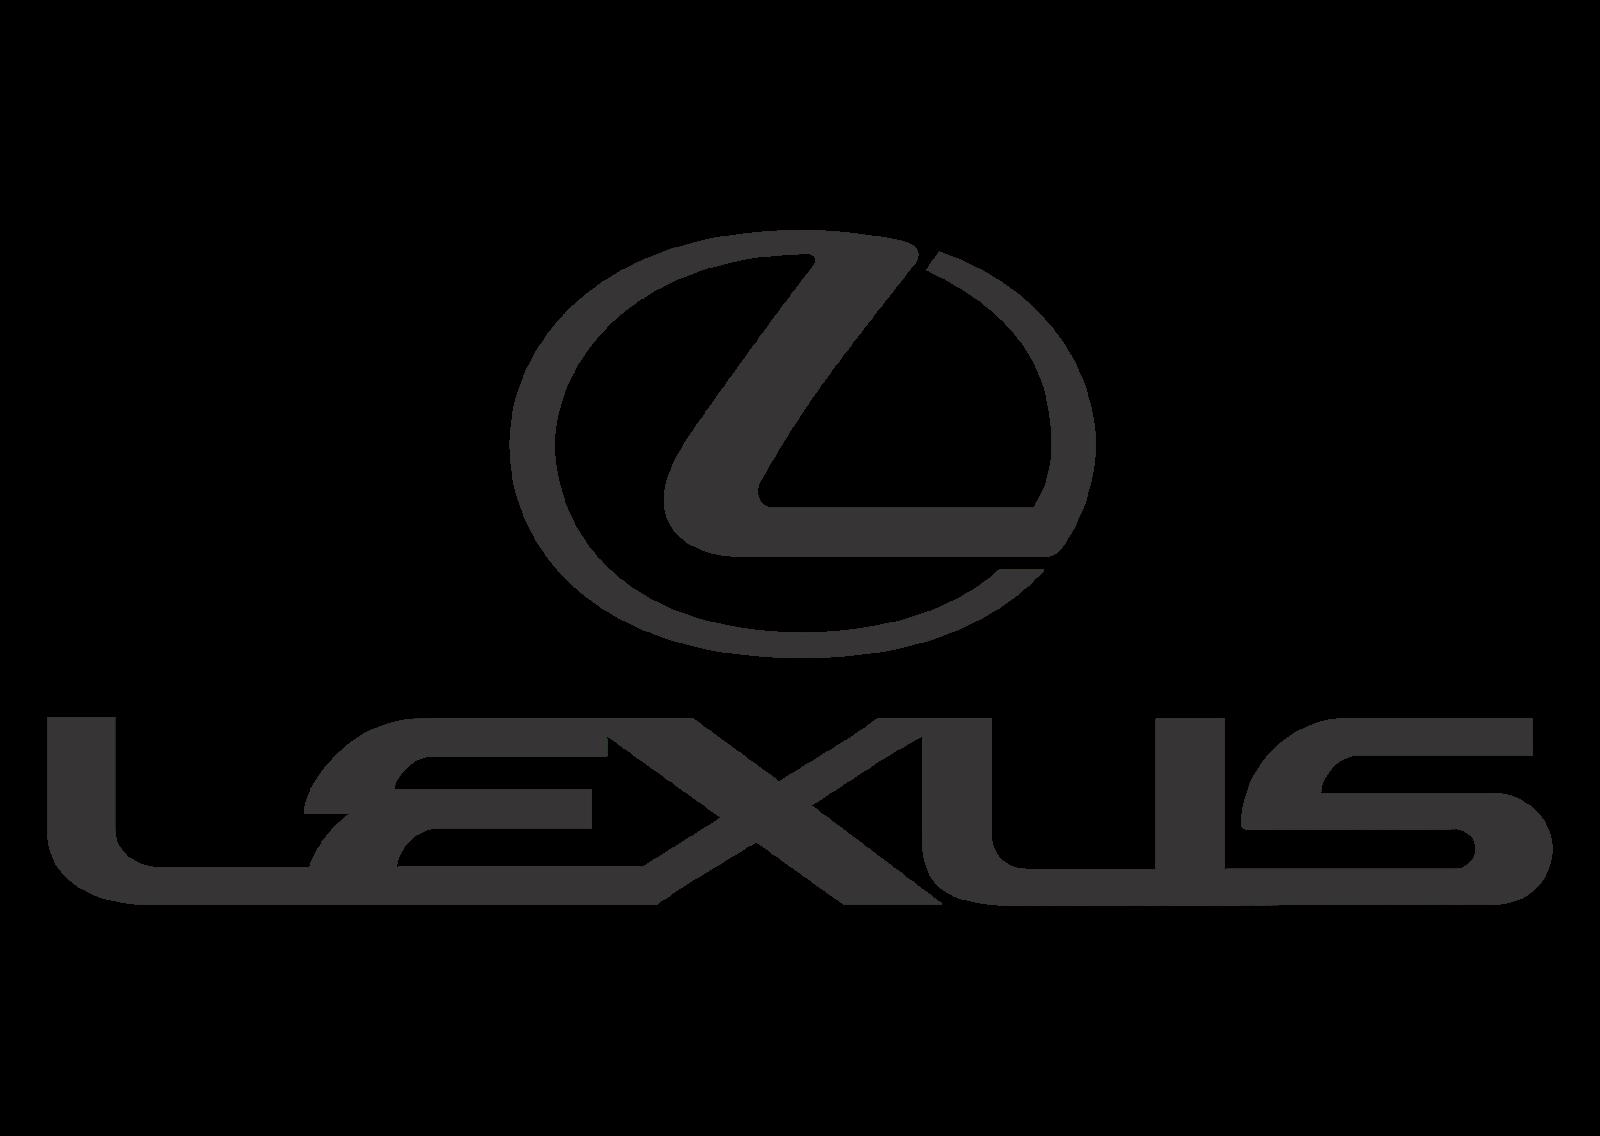 Lexus Auto Logo Vector PNG